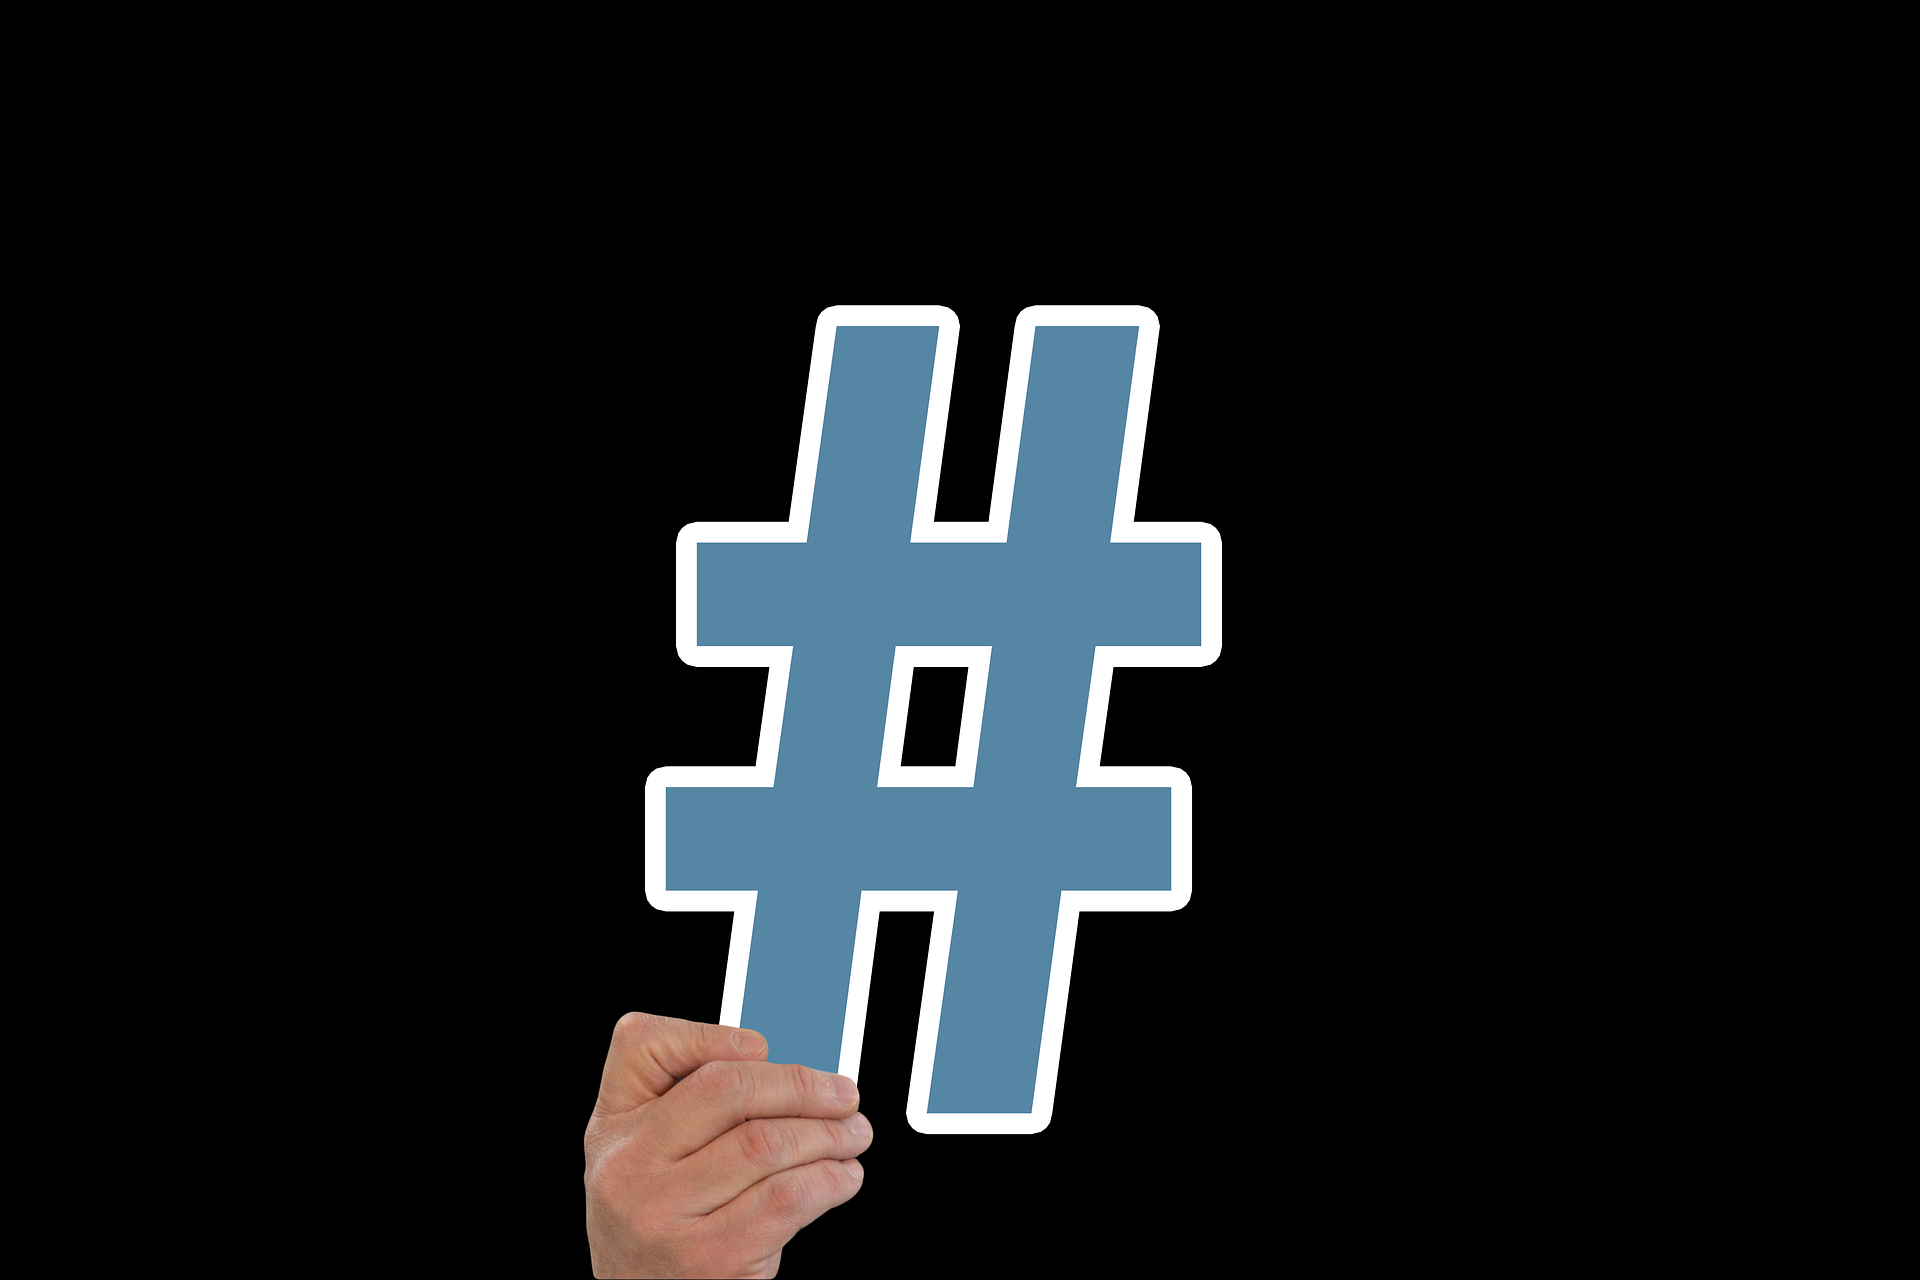 hashtag-3838907_1920